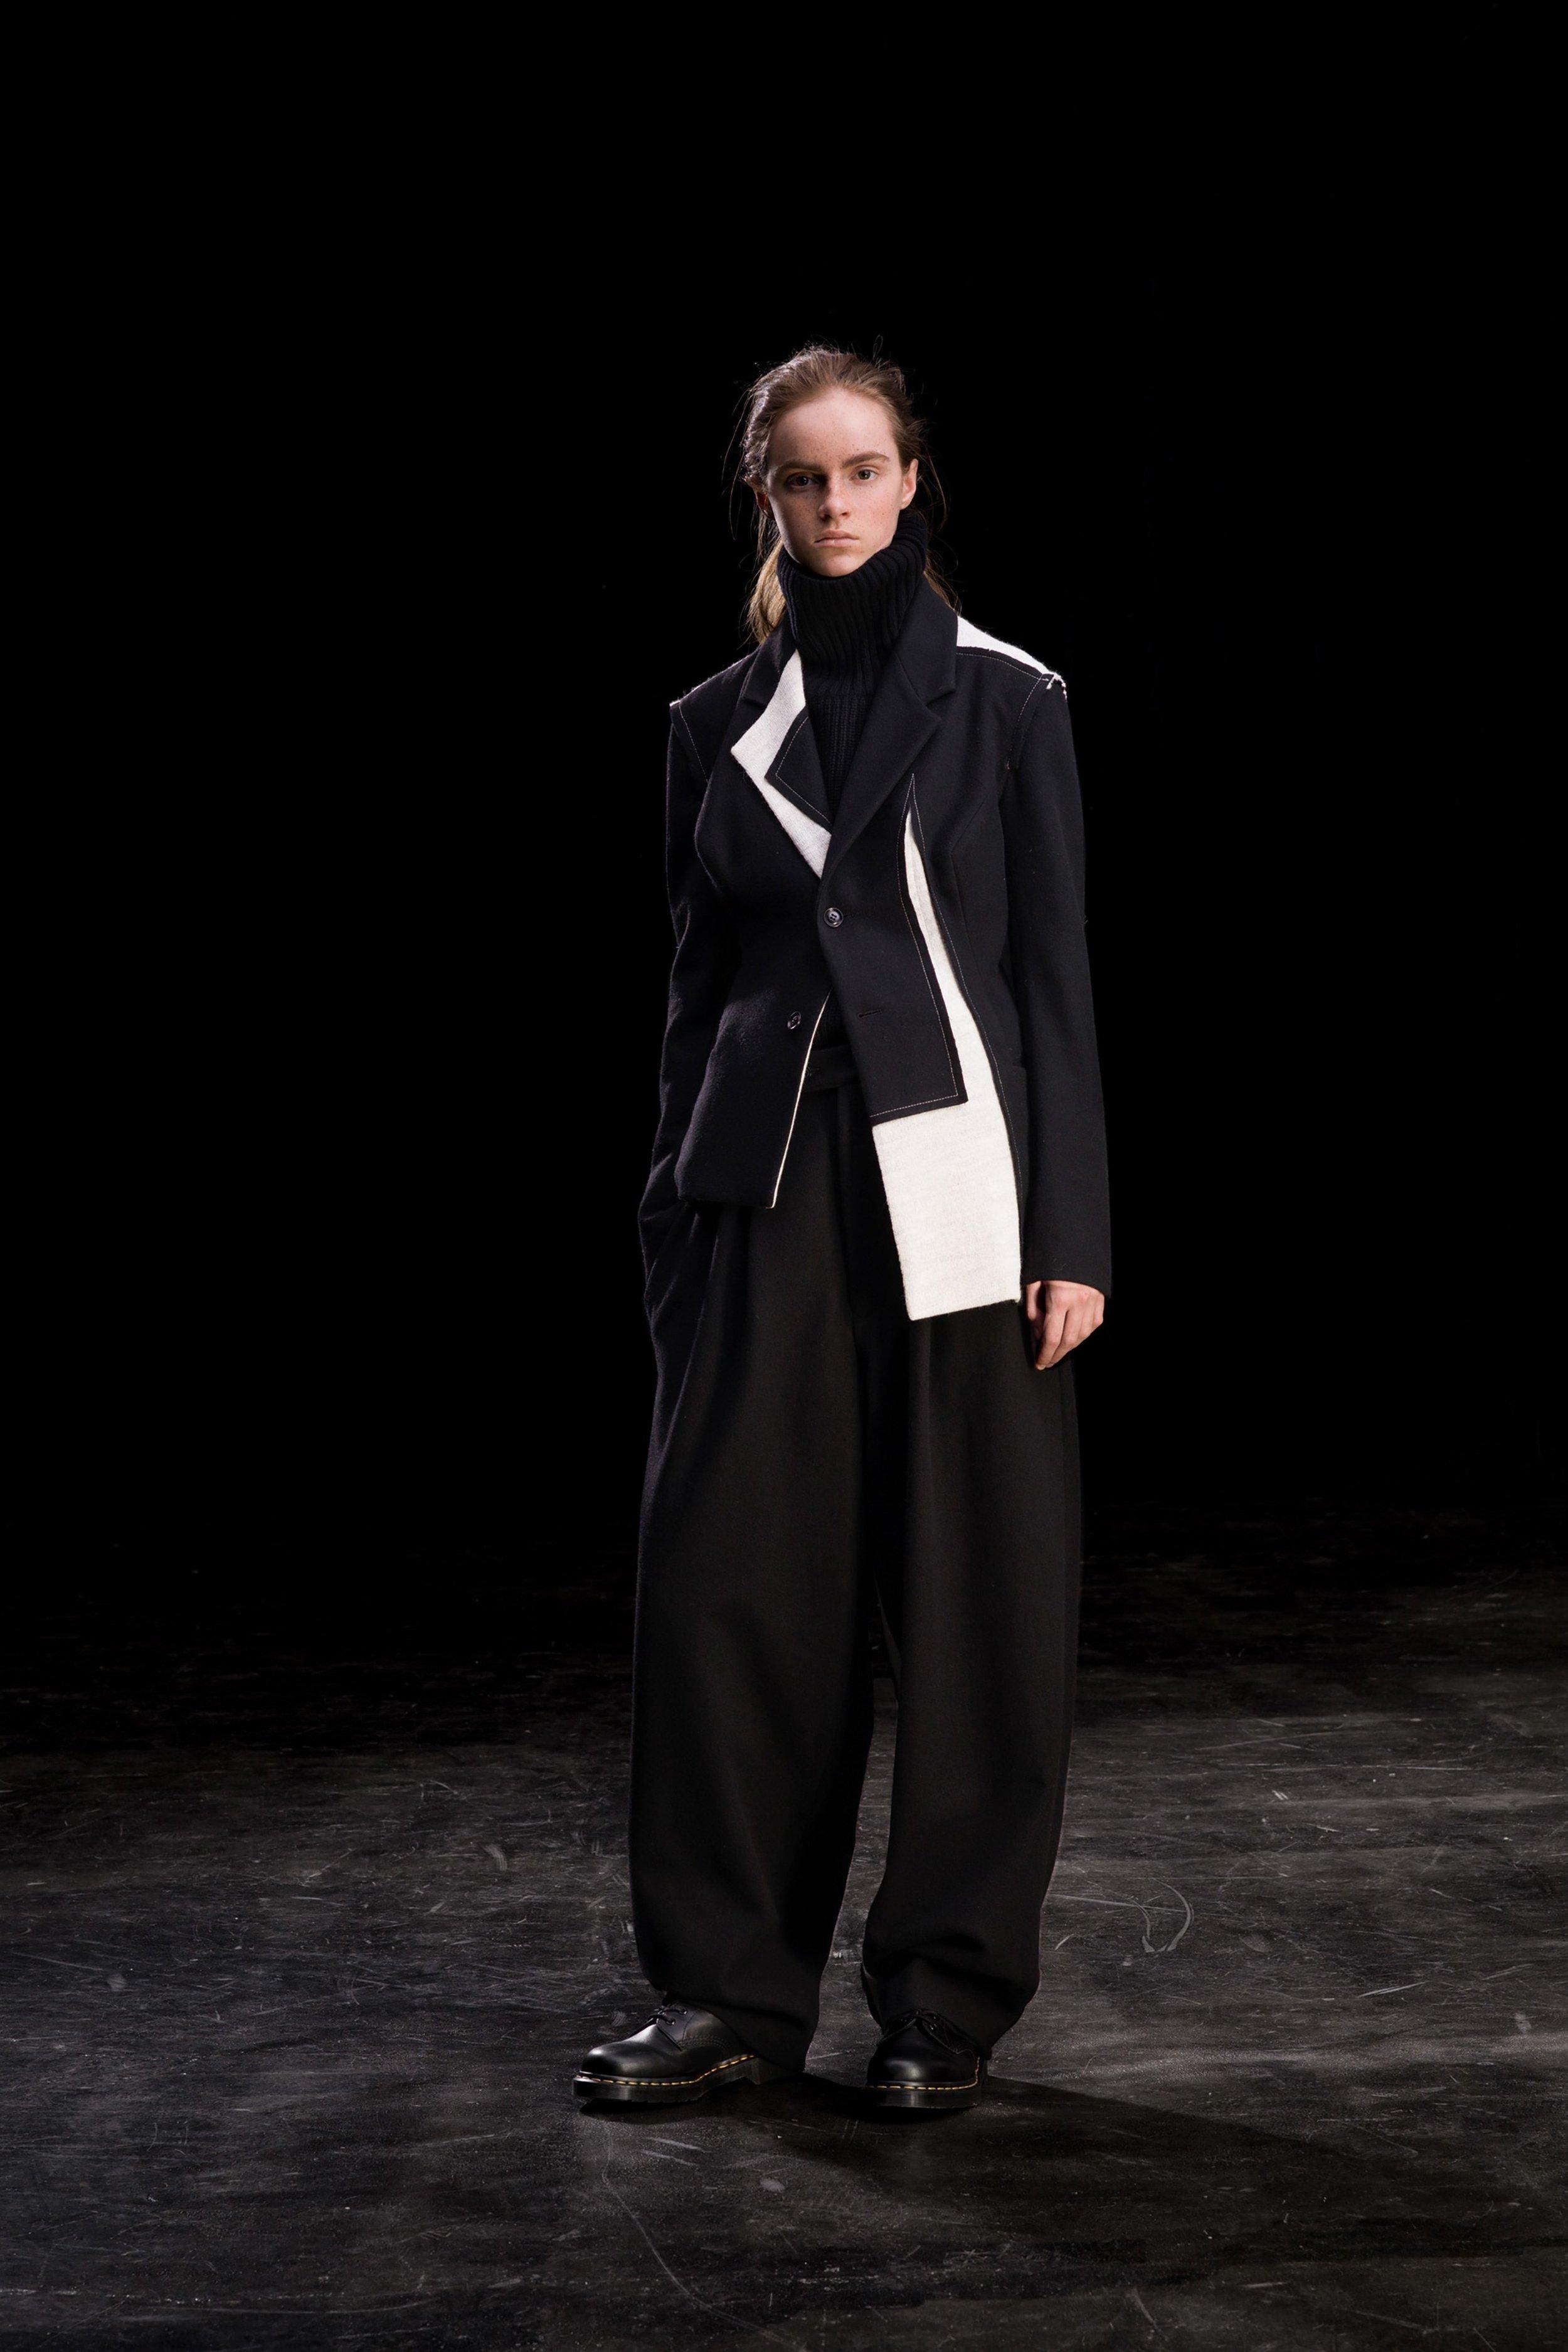 00006-Ys-Yohji-Yamamoto-FALL-19-Ready-To-Wear.jpg